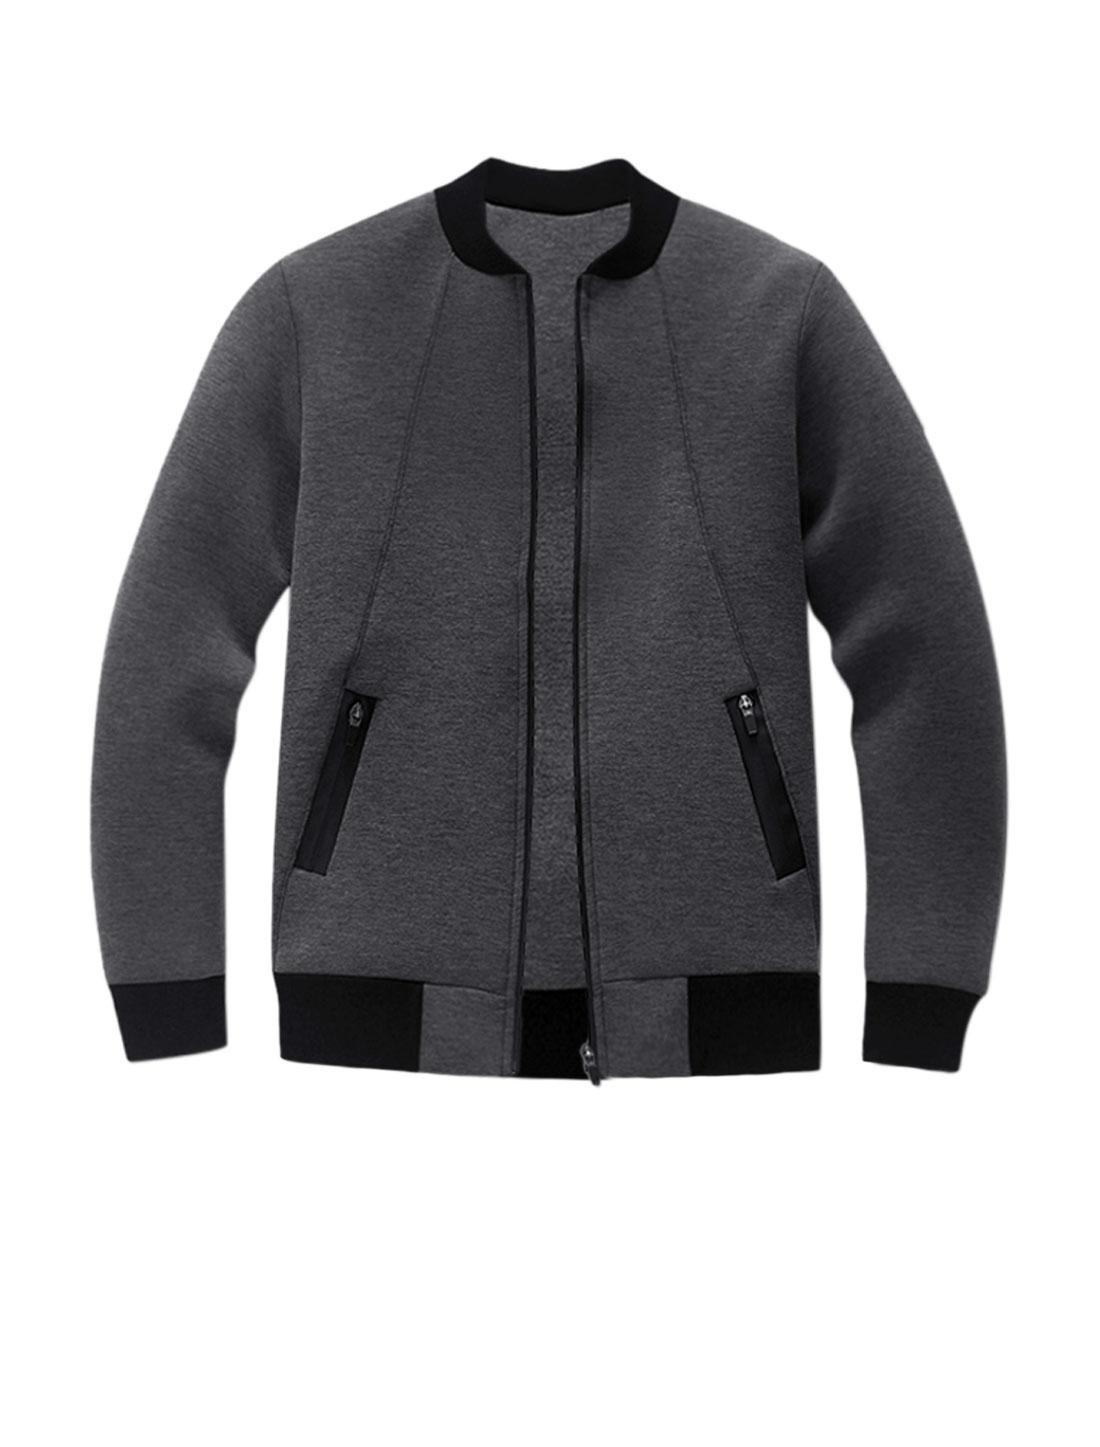 Men Long Sleeves Stand Collar Zip Up Slim Fit Jacket Gray M